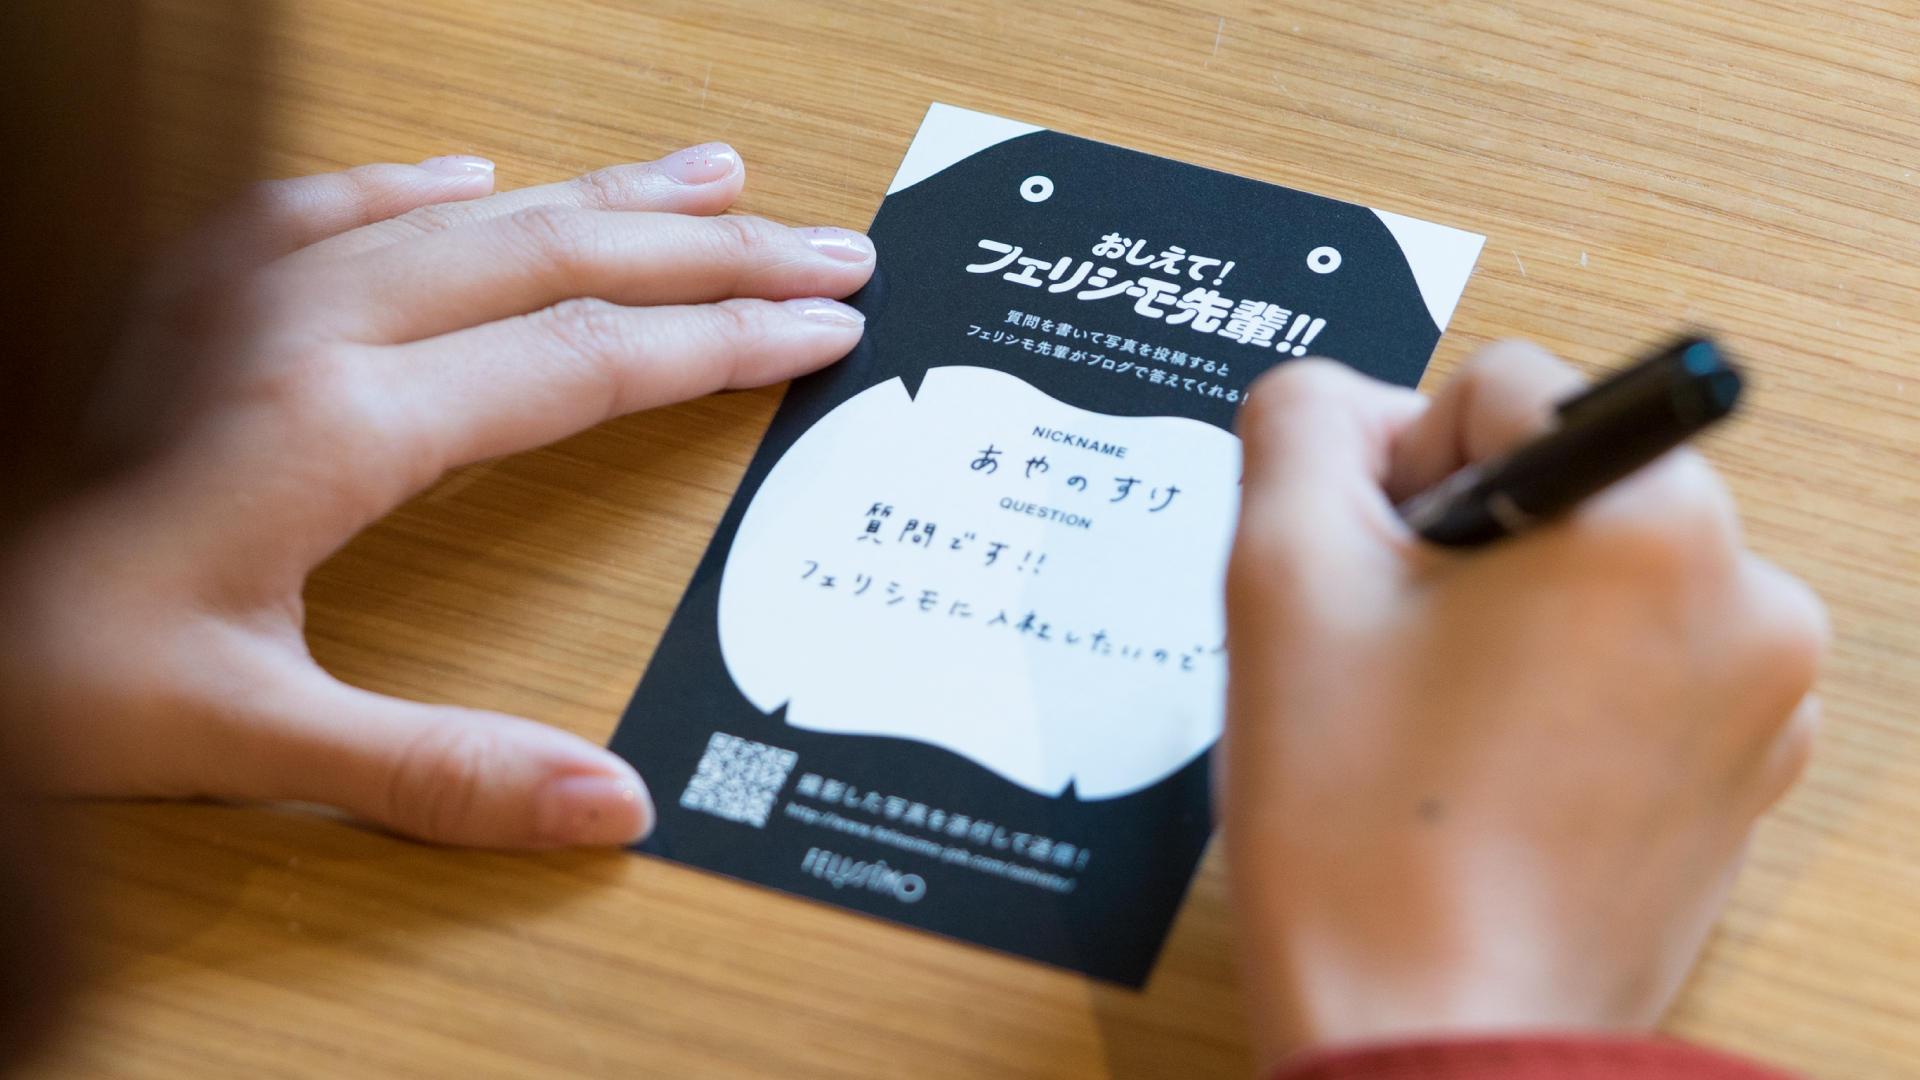 FELISSIMO RECRUITING 2019<br>ノベルティ/おしえて!フェリシモ先輩!01